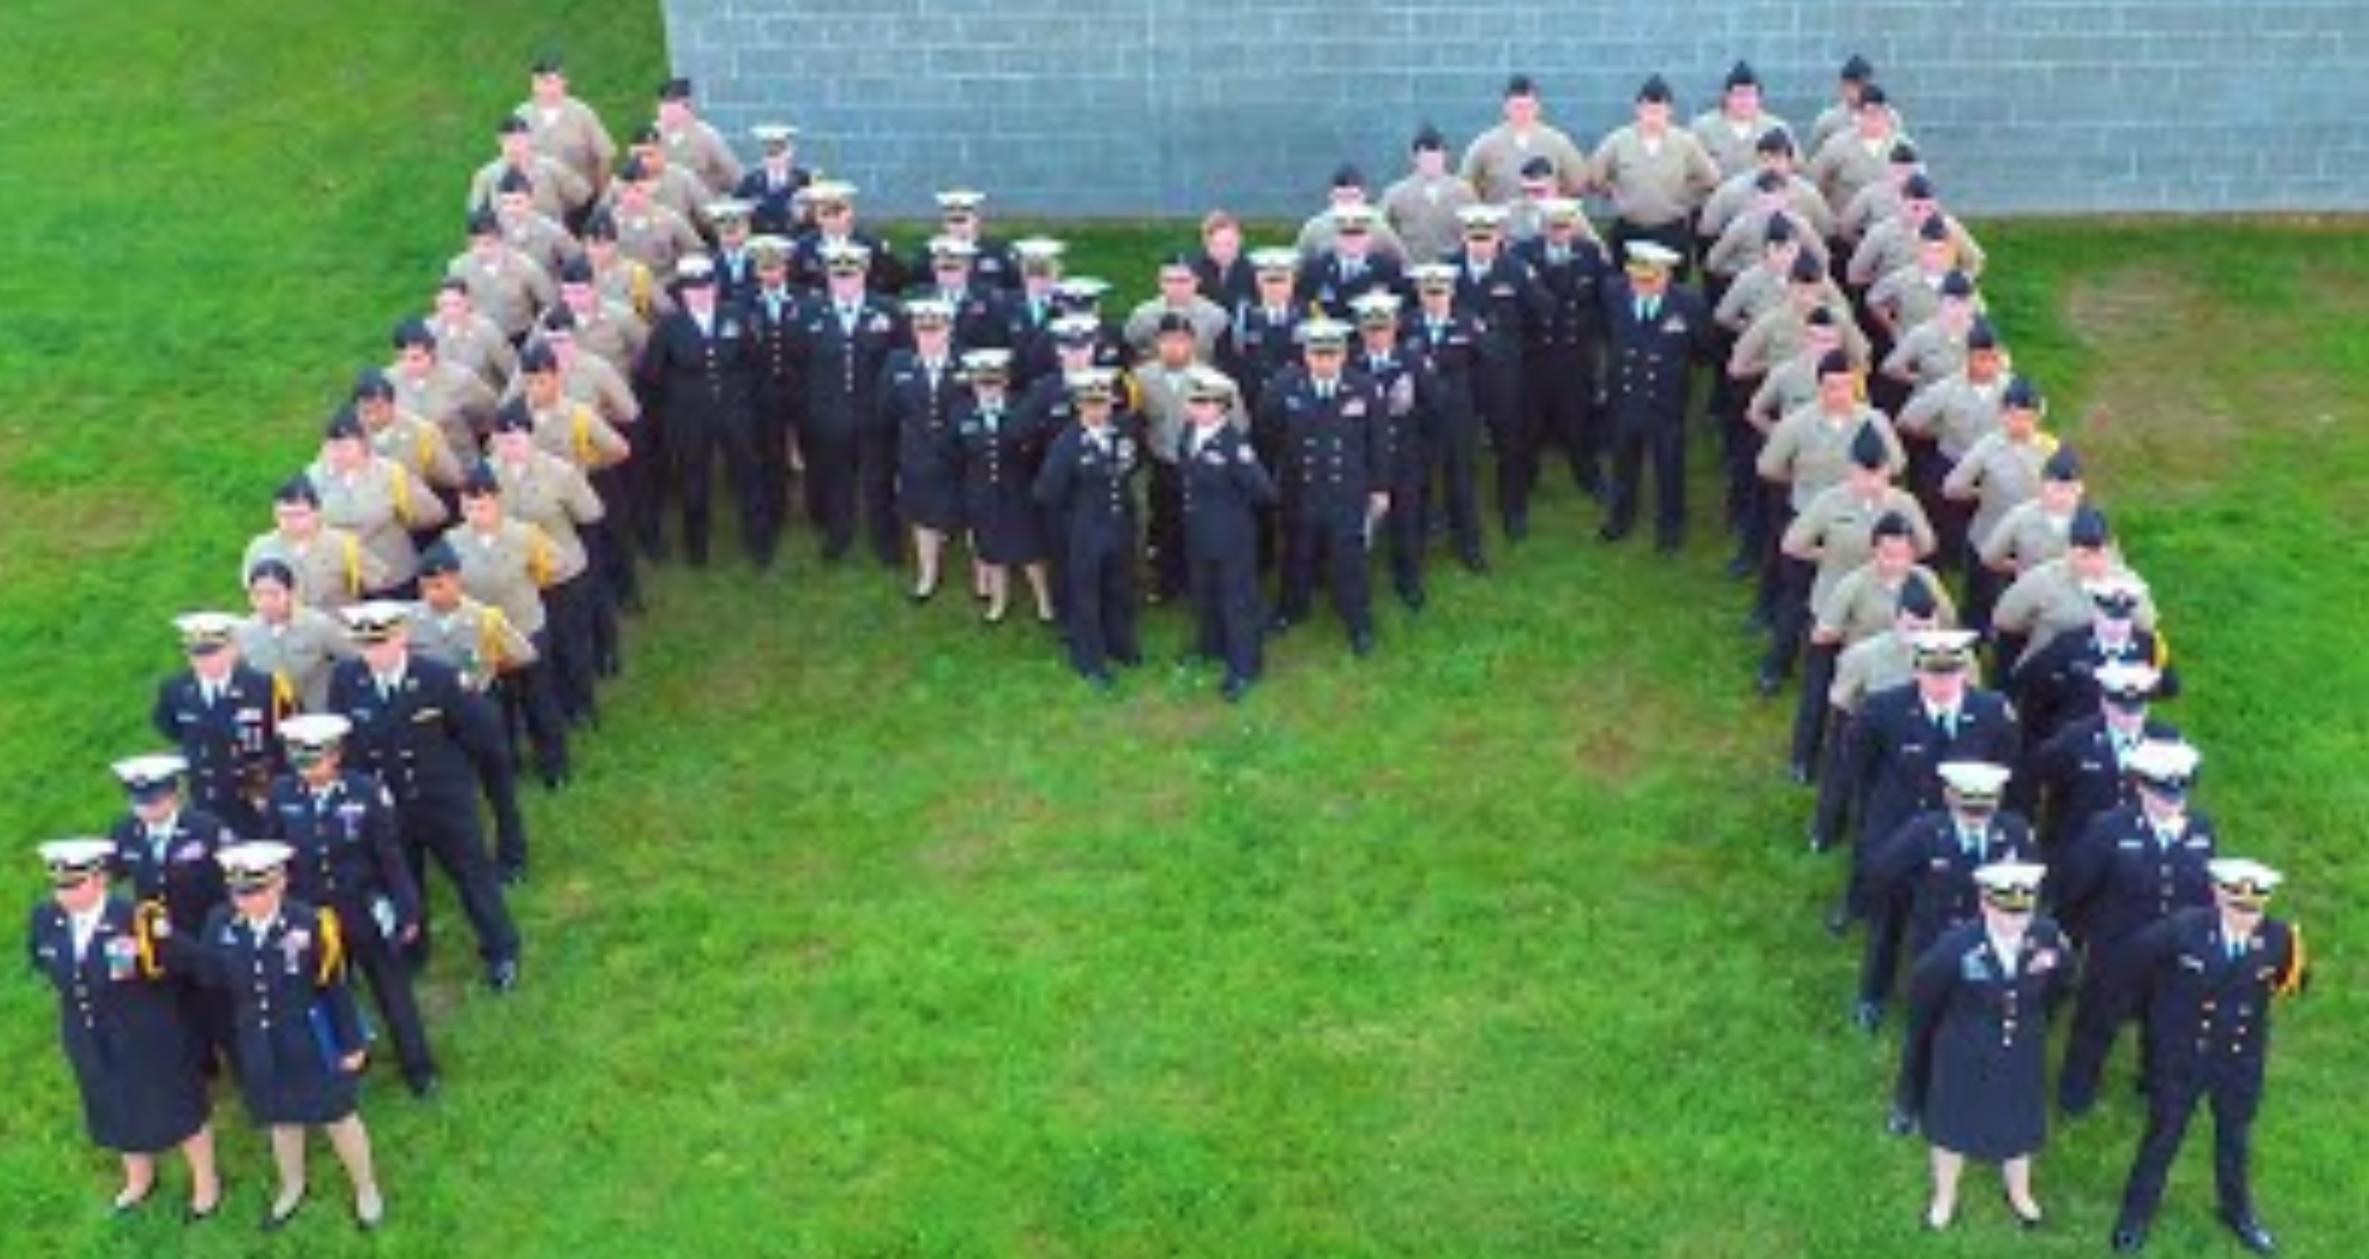 MARYSVILLE NAVY JUNIOR RESERVE OFFICERS TRAINING CORPS